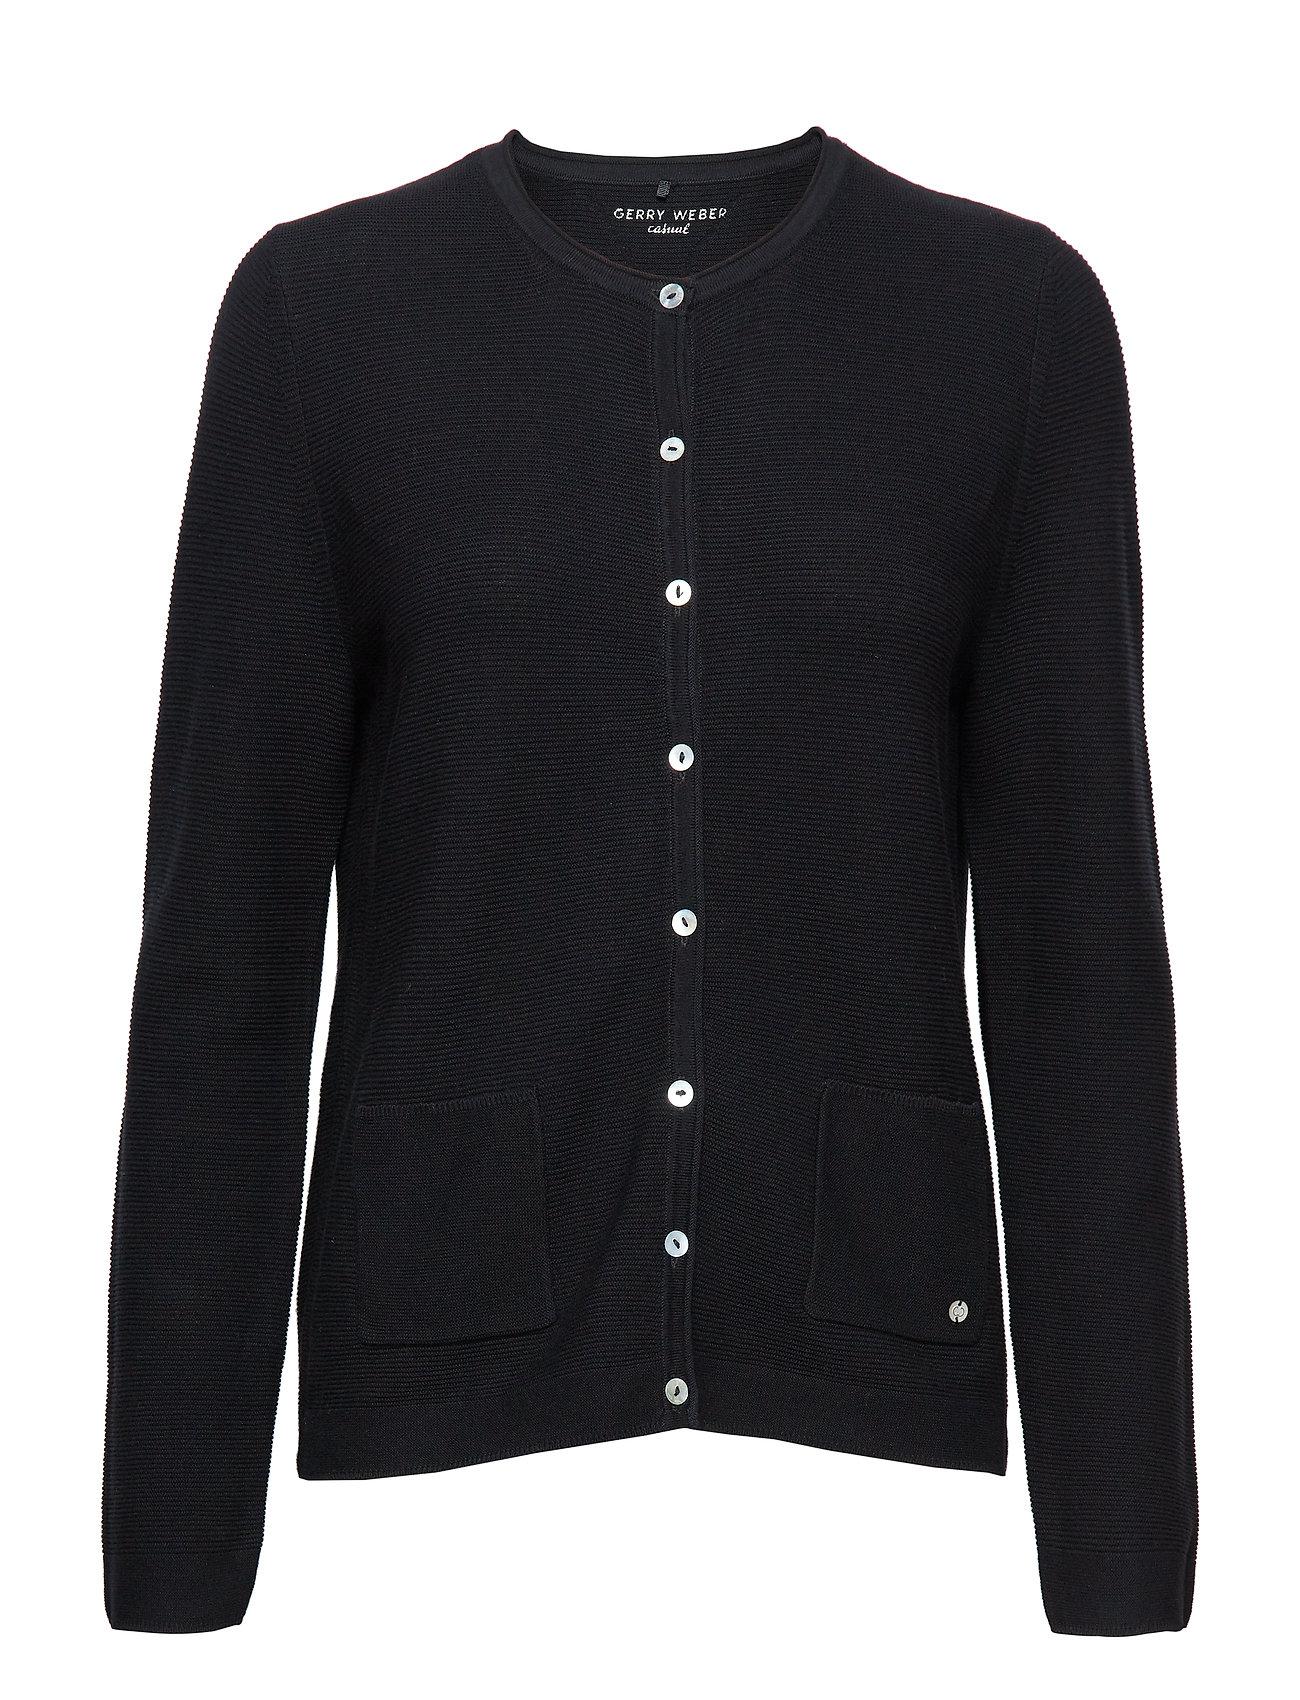 Jacket Knitwear - Gerry Weber Edition